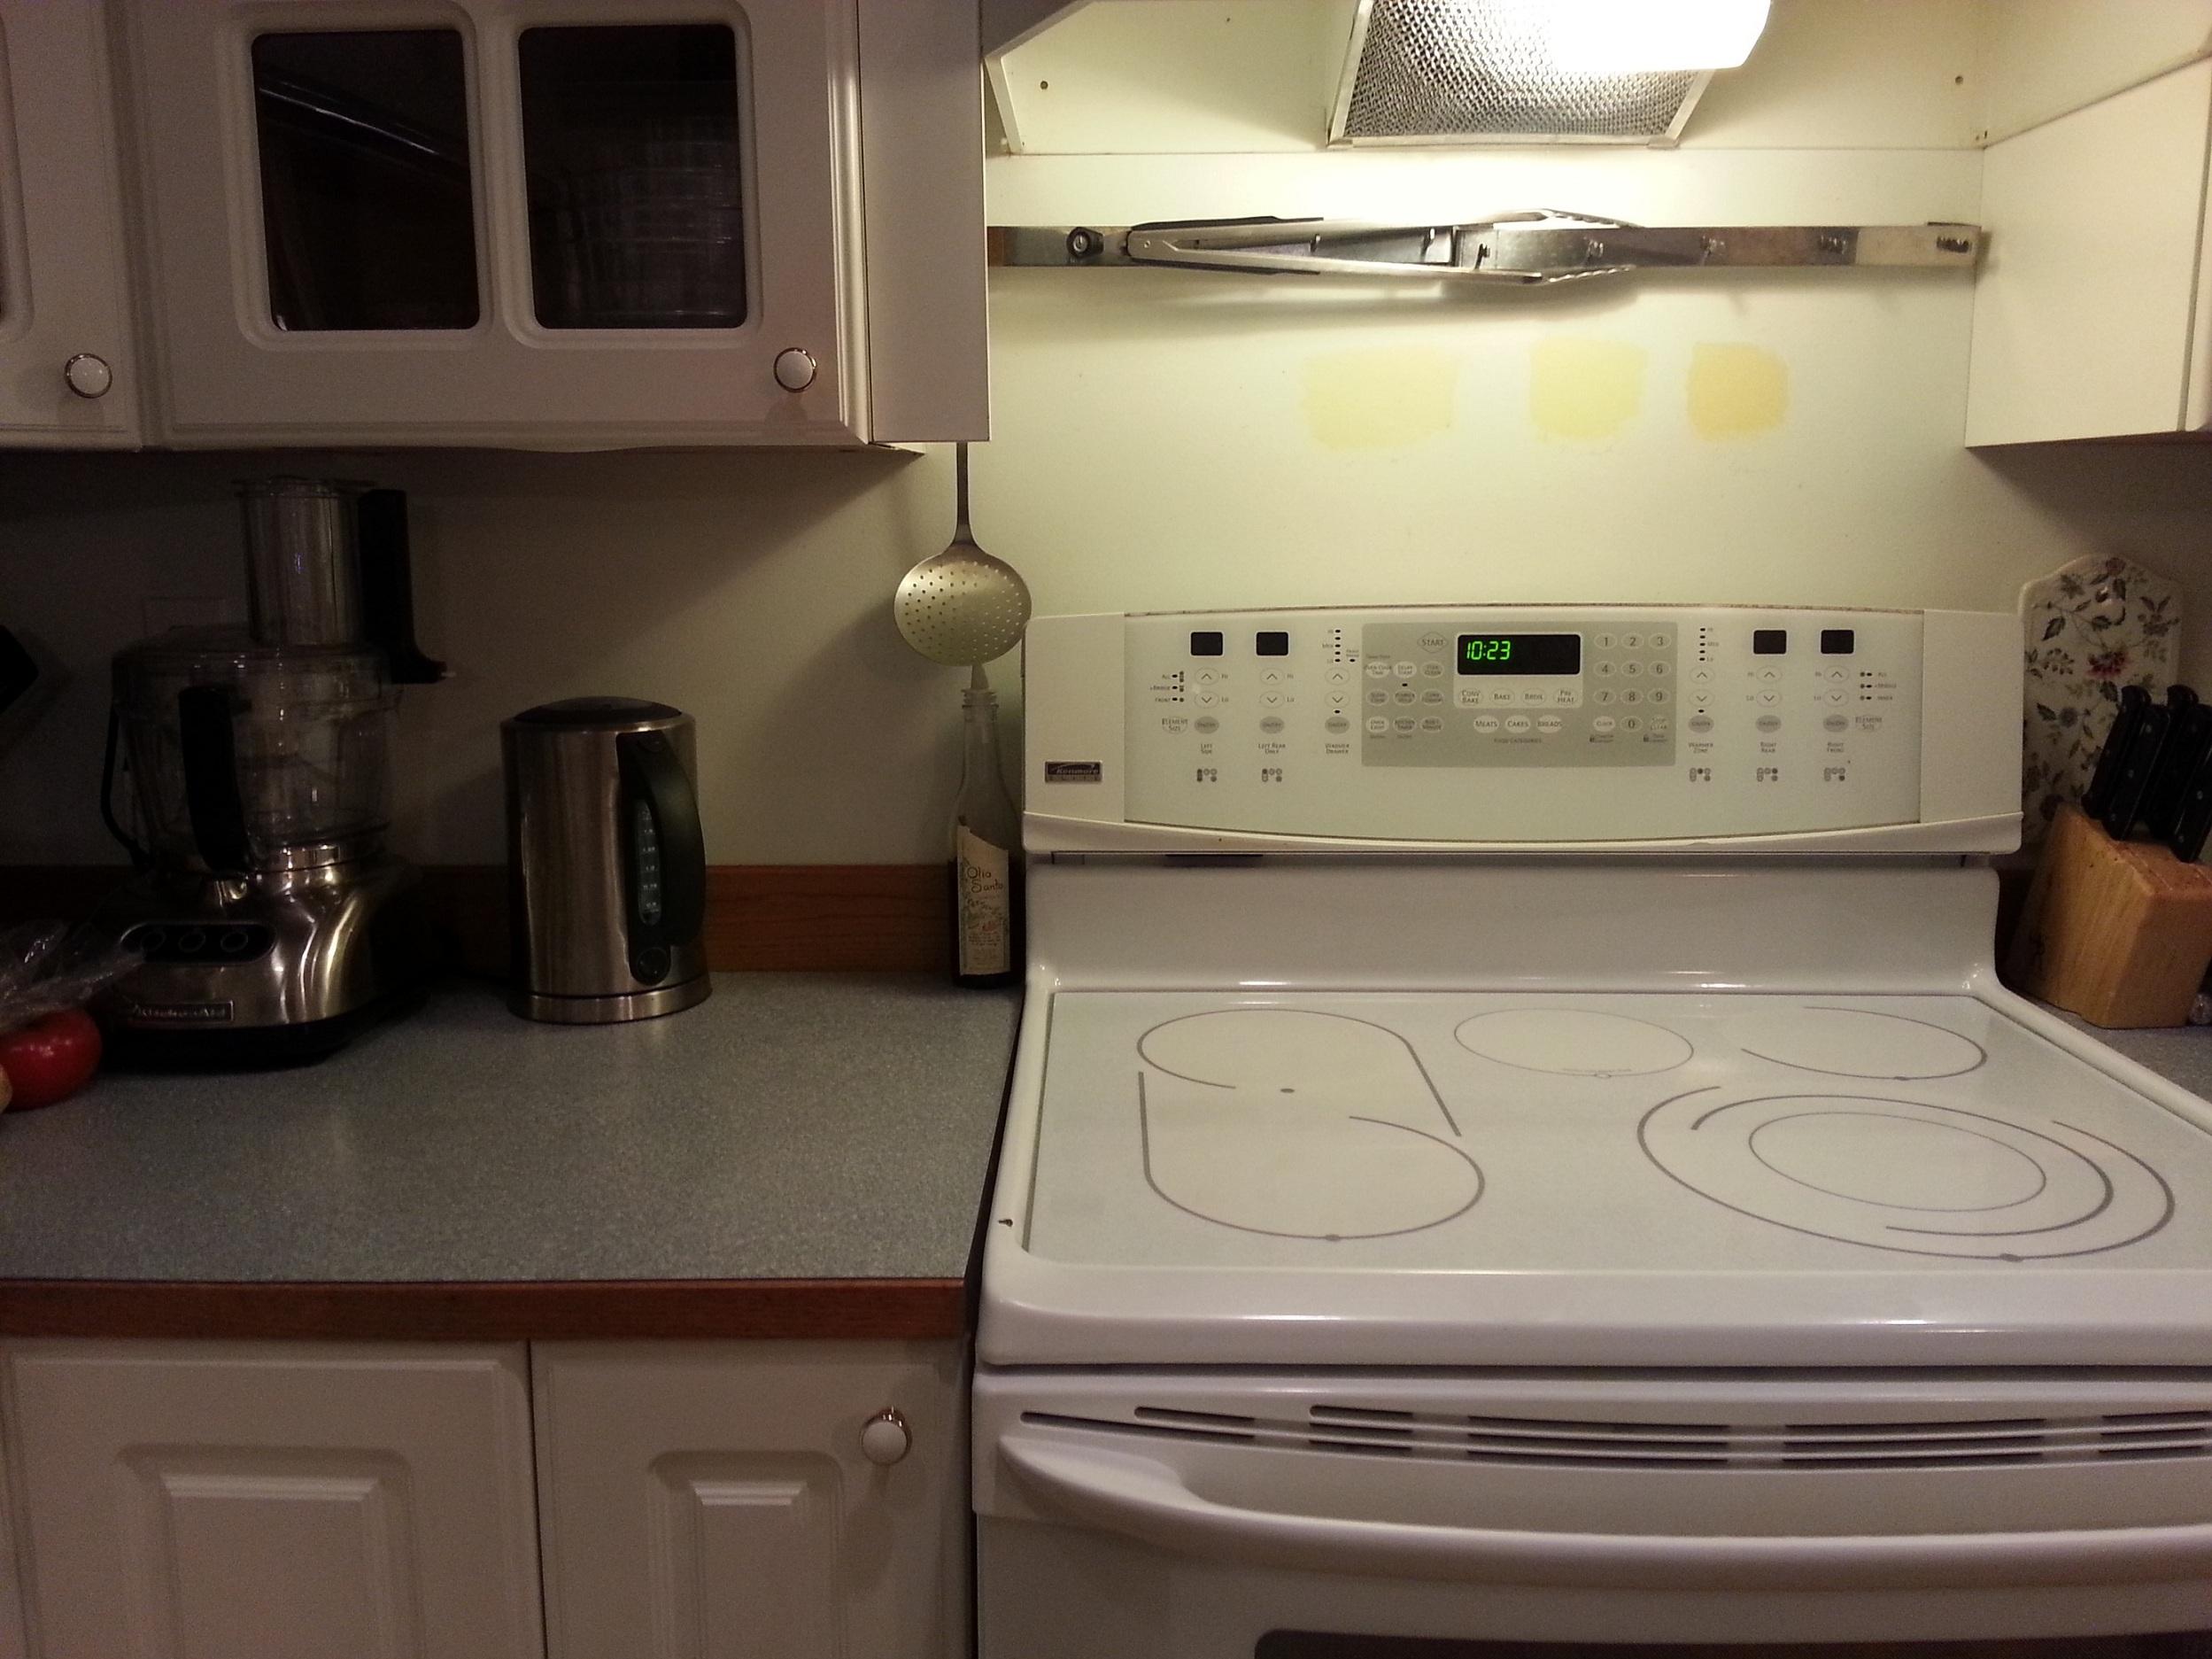 bianco romano laminate countertop laminate kitchen backsplash options remove